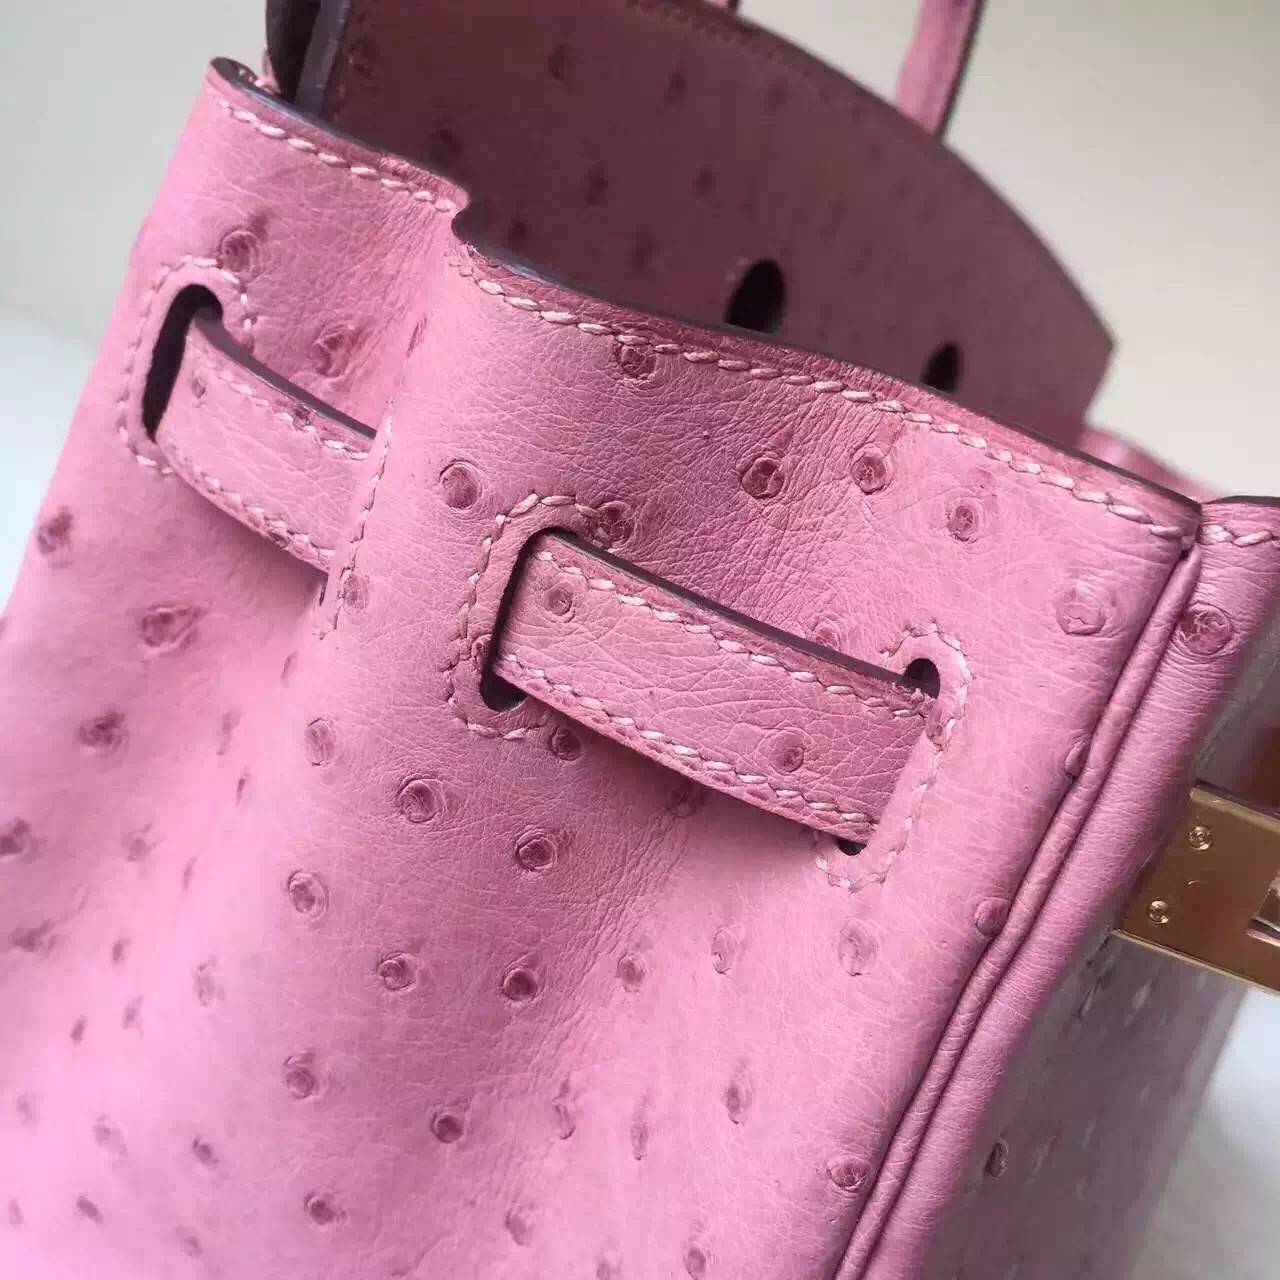 New Pretty Hermes CC94 Terre Cuite Ostrich Leather Birkin Bag 25cm